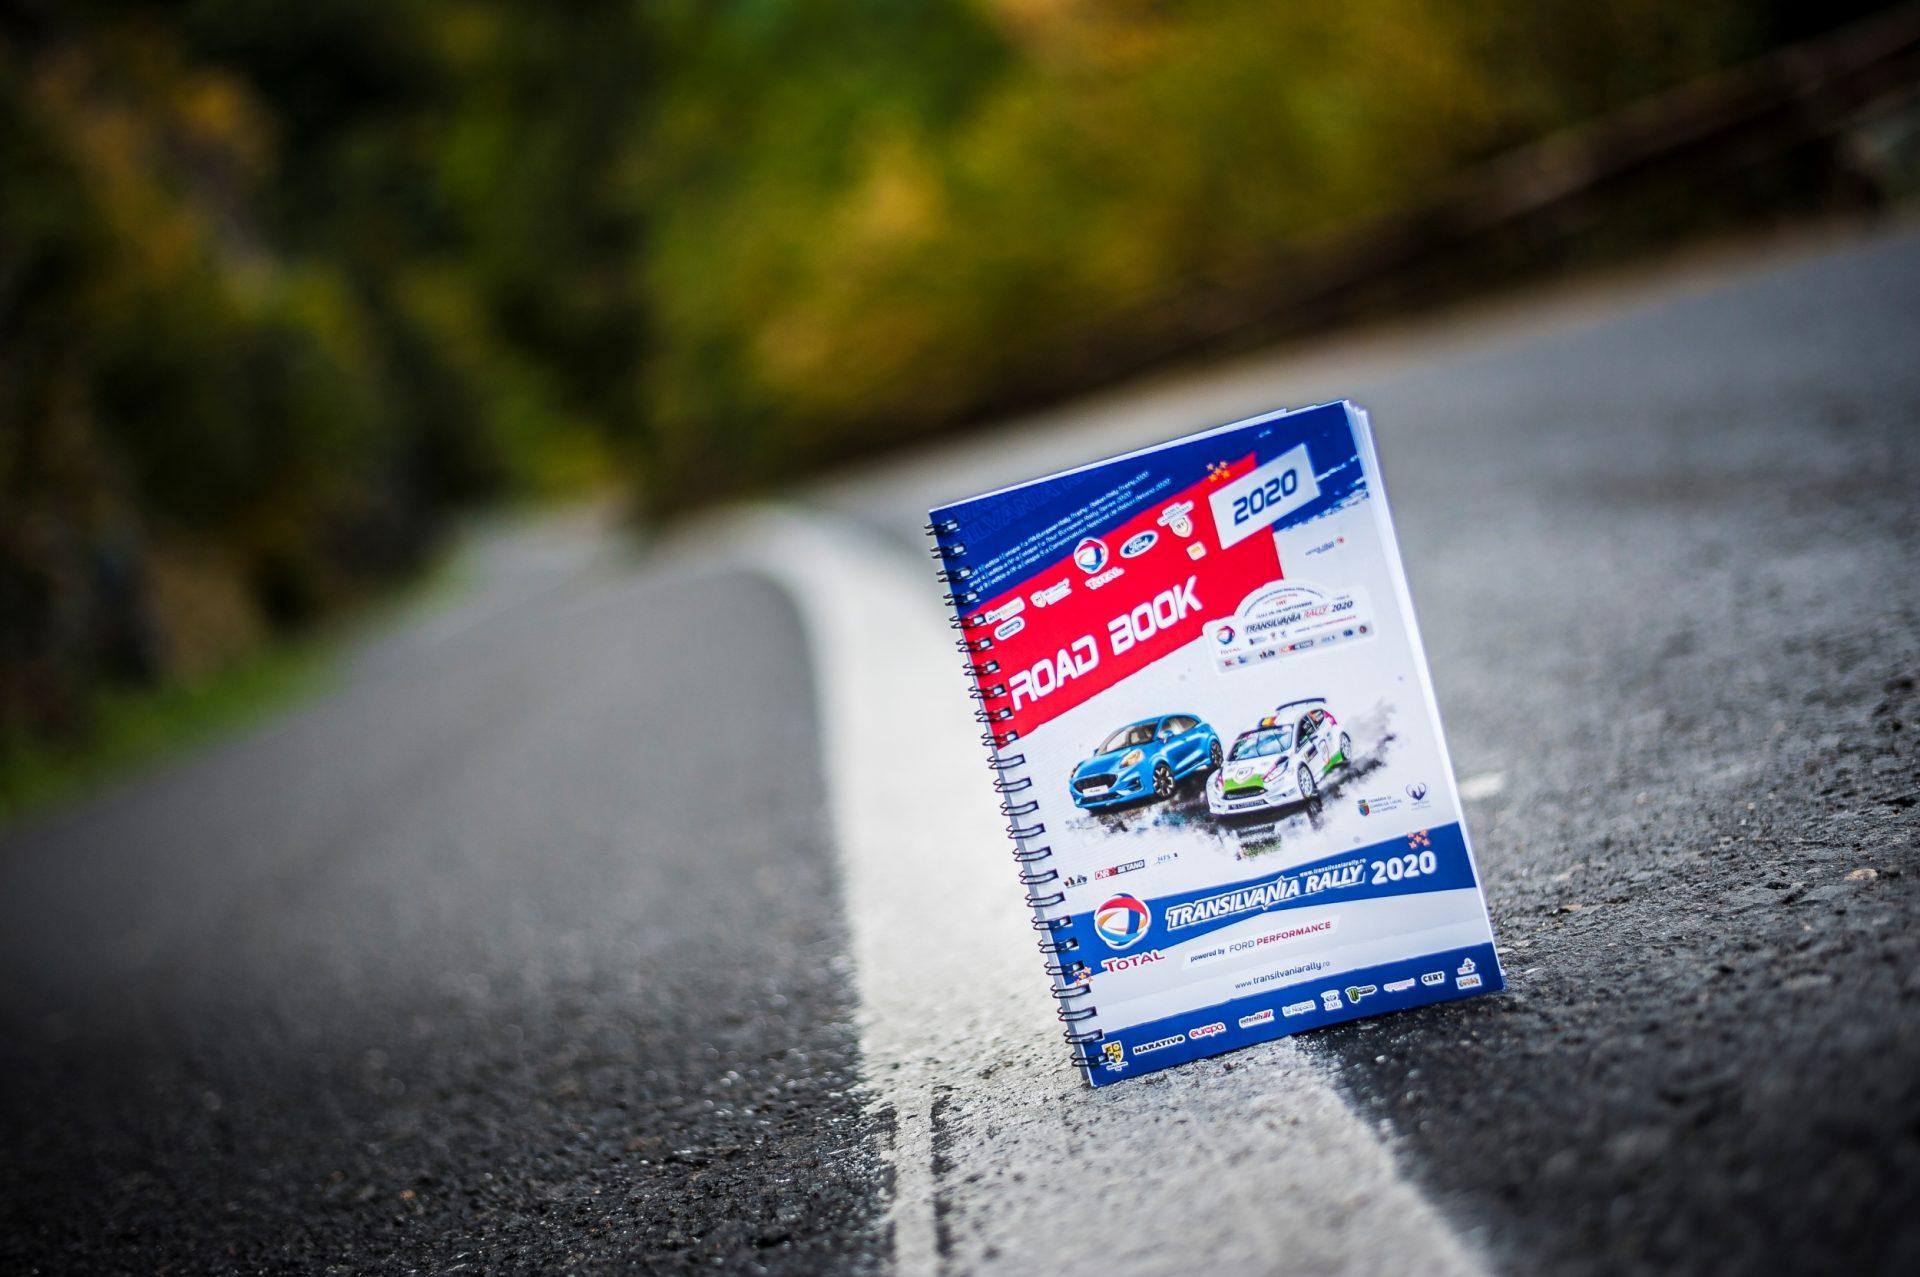 Marco Tempestini despre absența Transilvania Rally în calendarul provizoriu CNR 2021